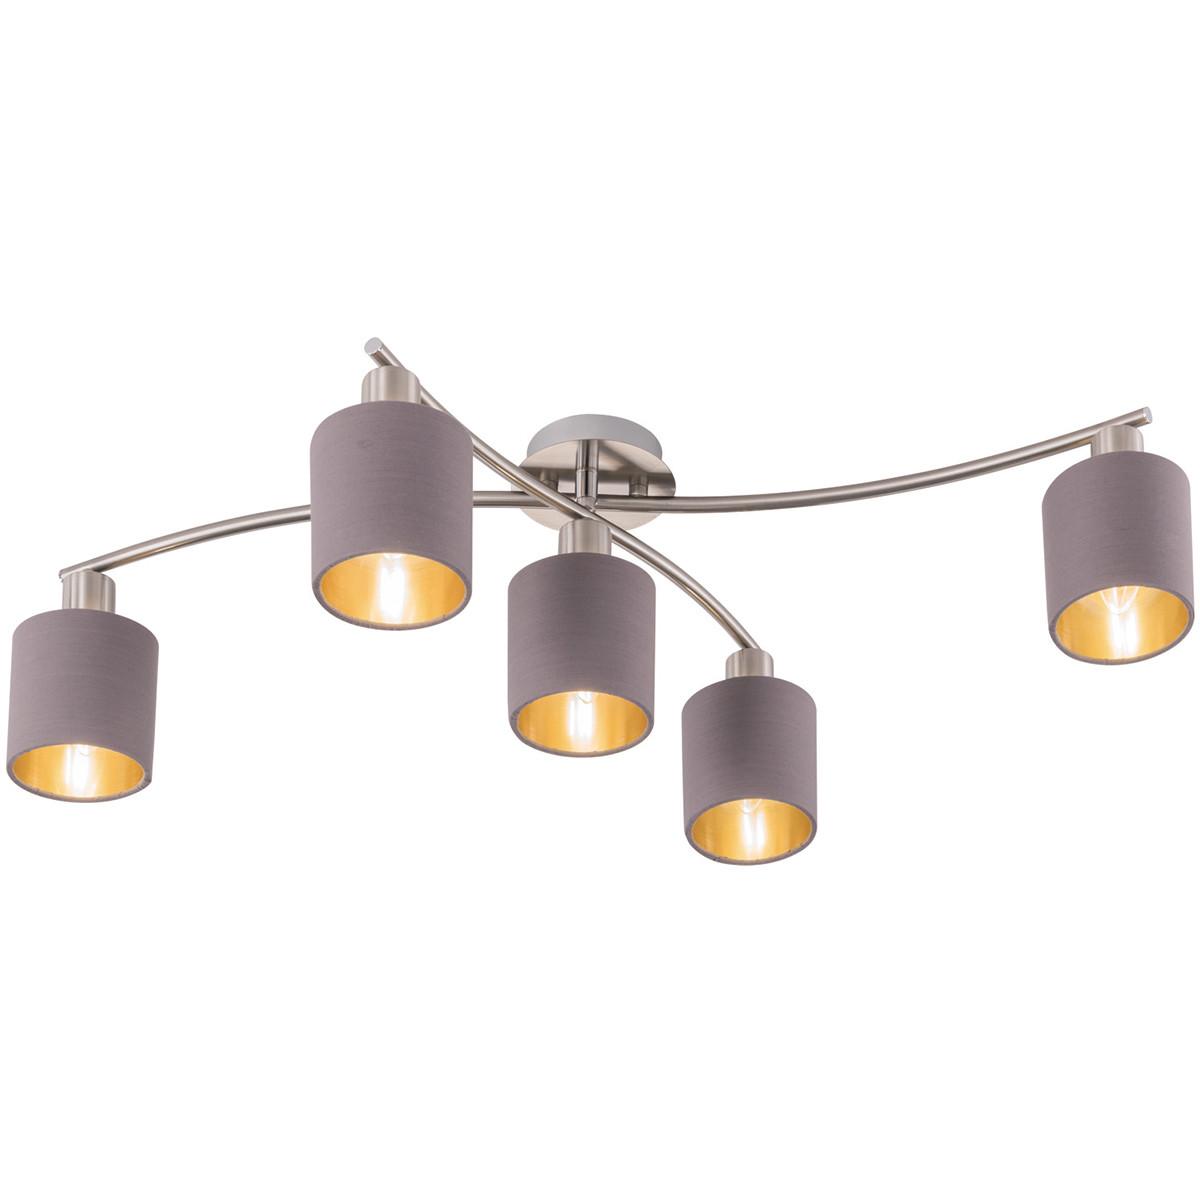 LED Plafondlamp - Trion Gorino - E14 Fitting - 5-lichts - Rond - Mat Bruin - Aluminium